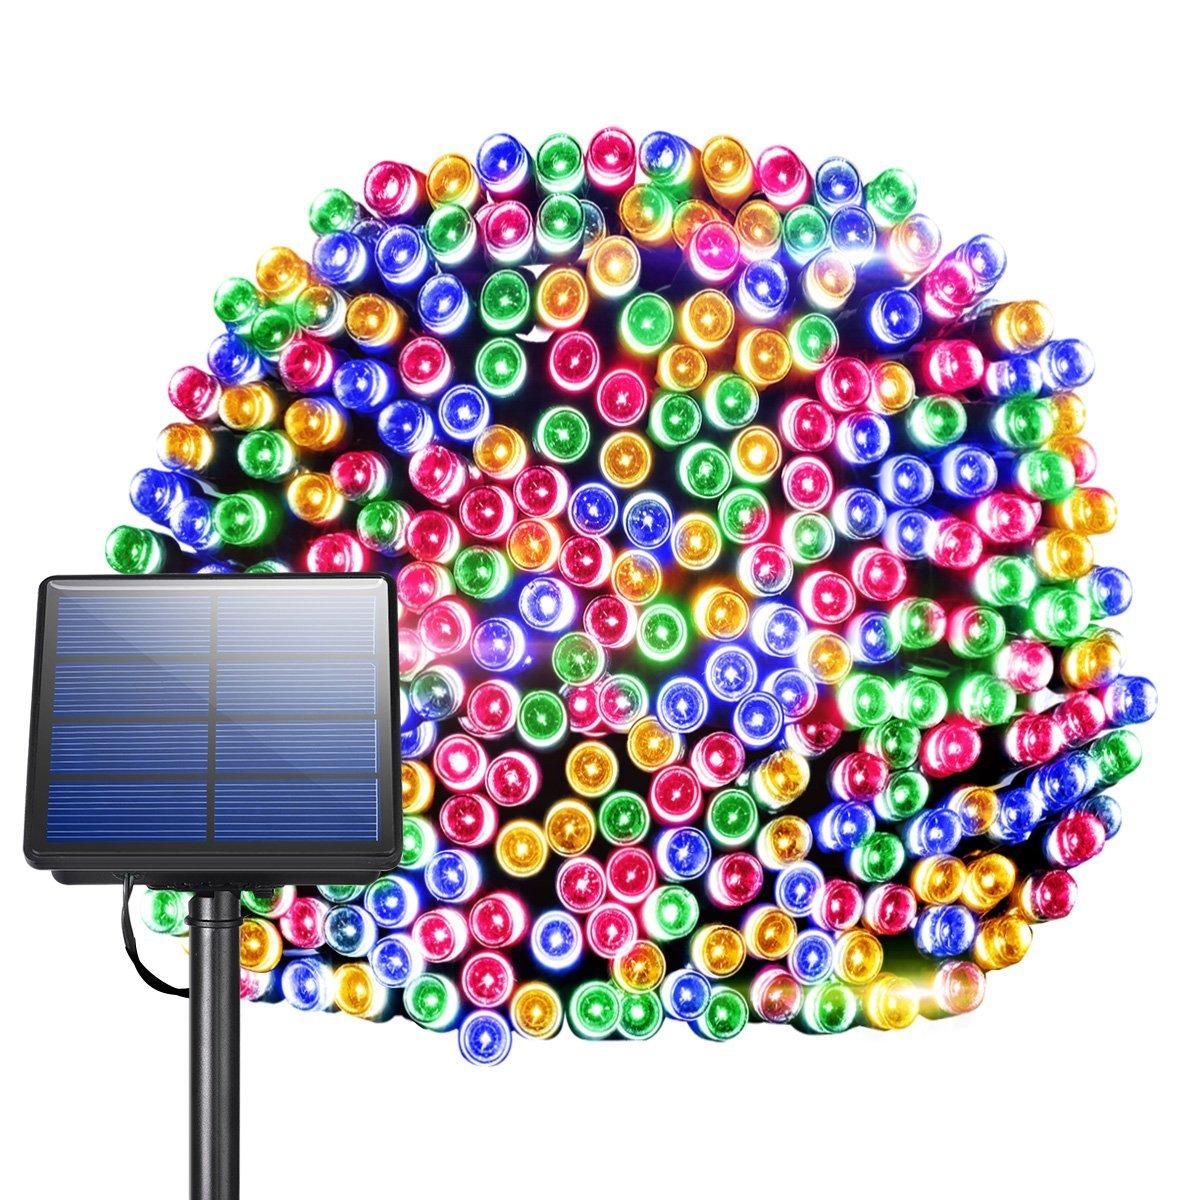 Tira de luces led solares, decoración de Navidad, luces de jardín, luces led intermitentes para exteriores, ocho lámparas de LUZ LED RGB